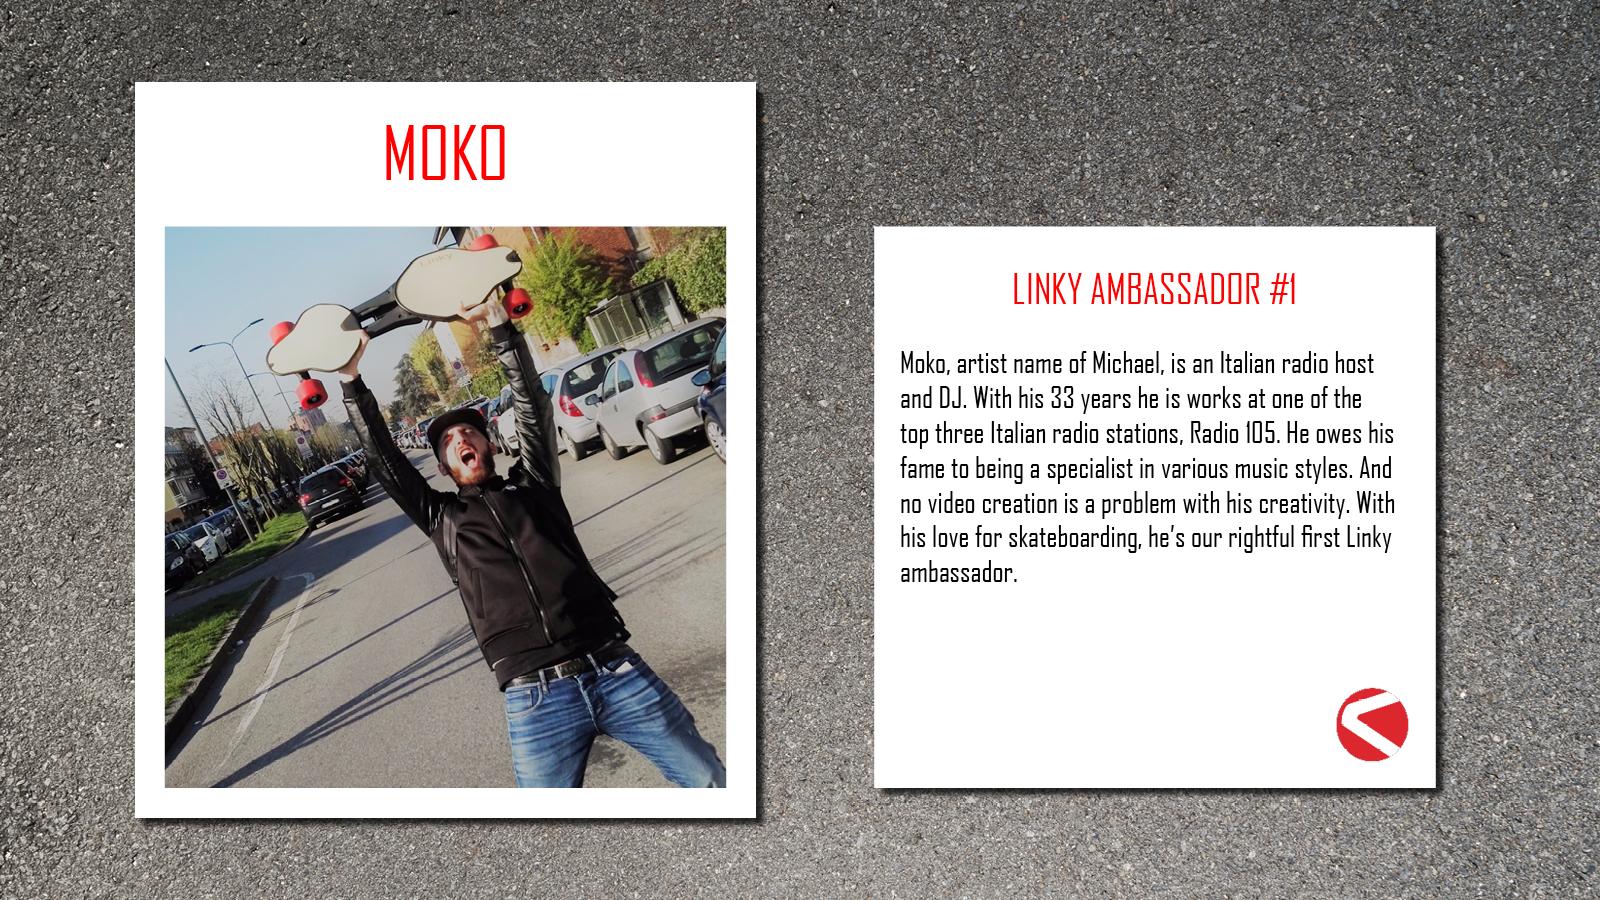 Ambassador 01 Moko